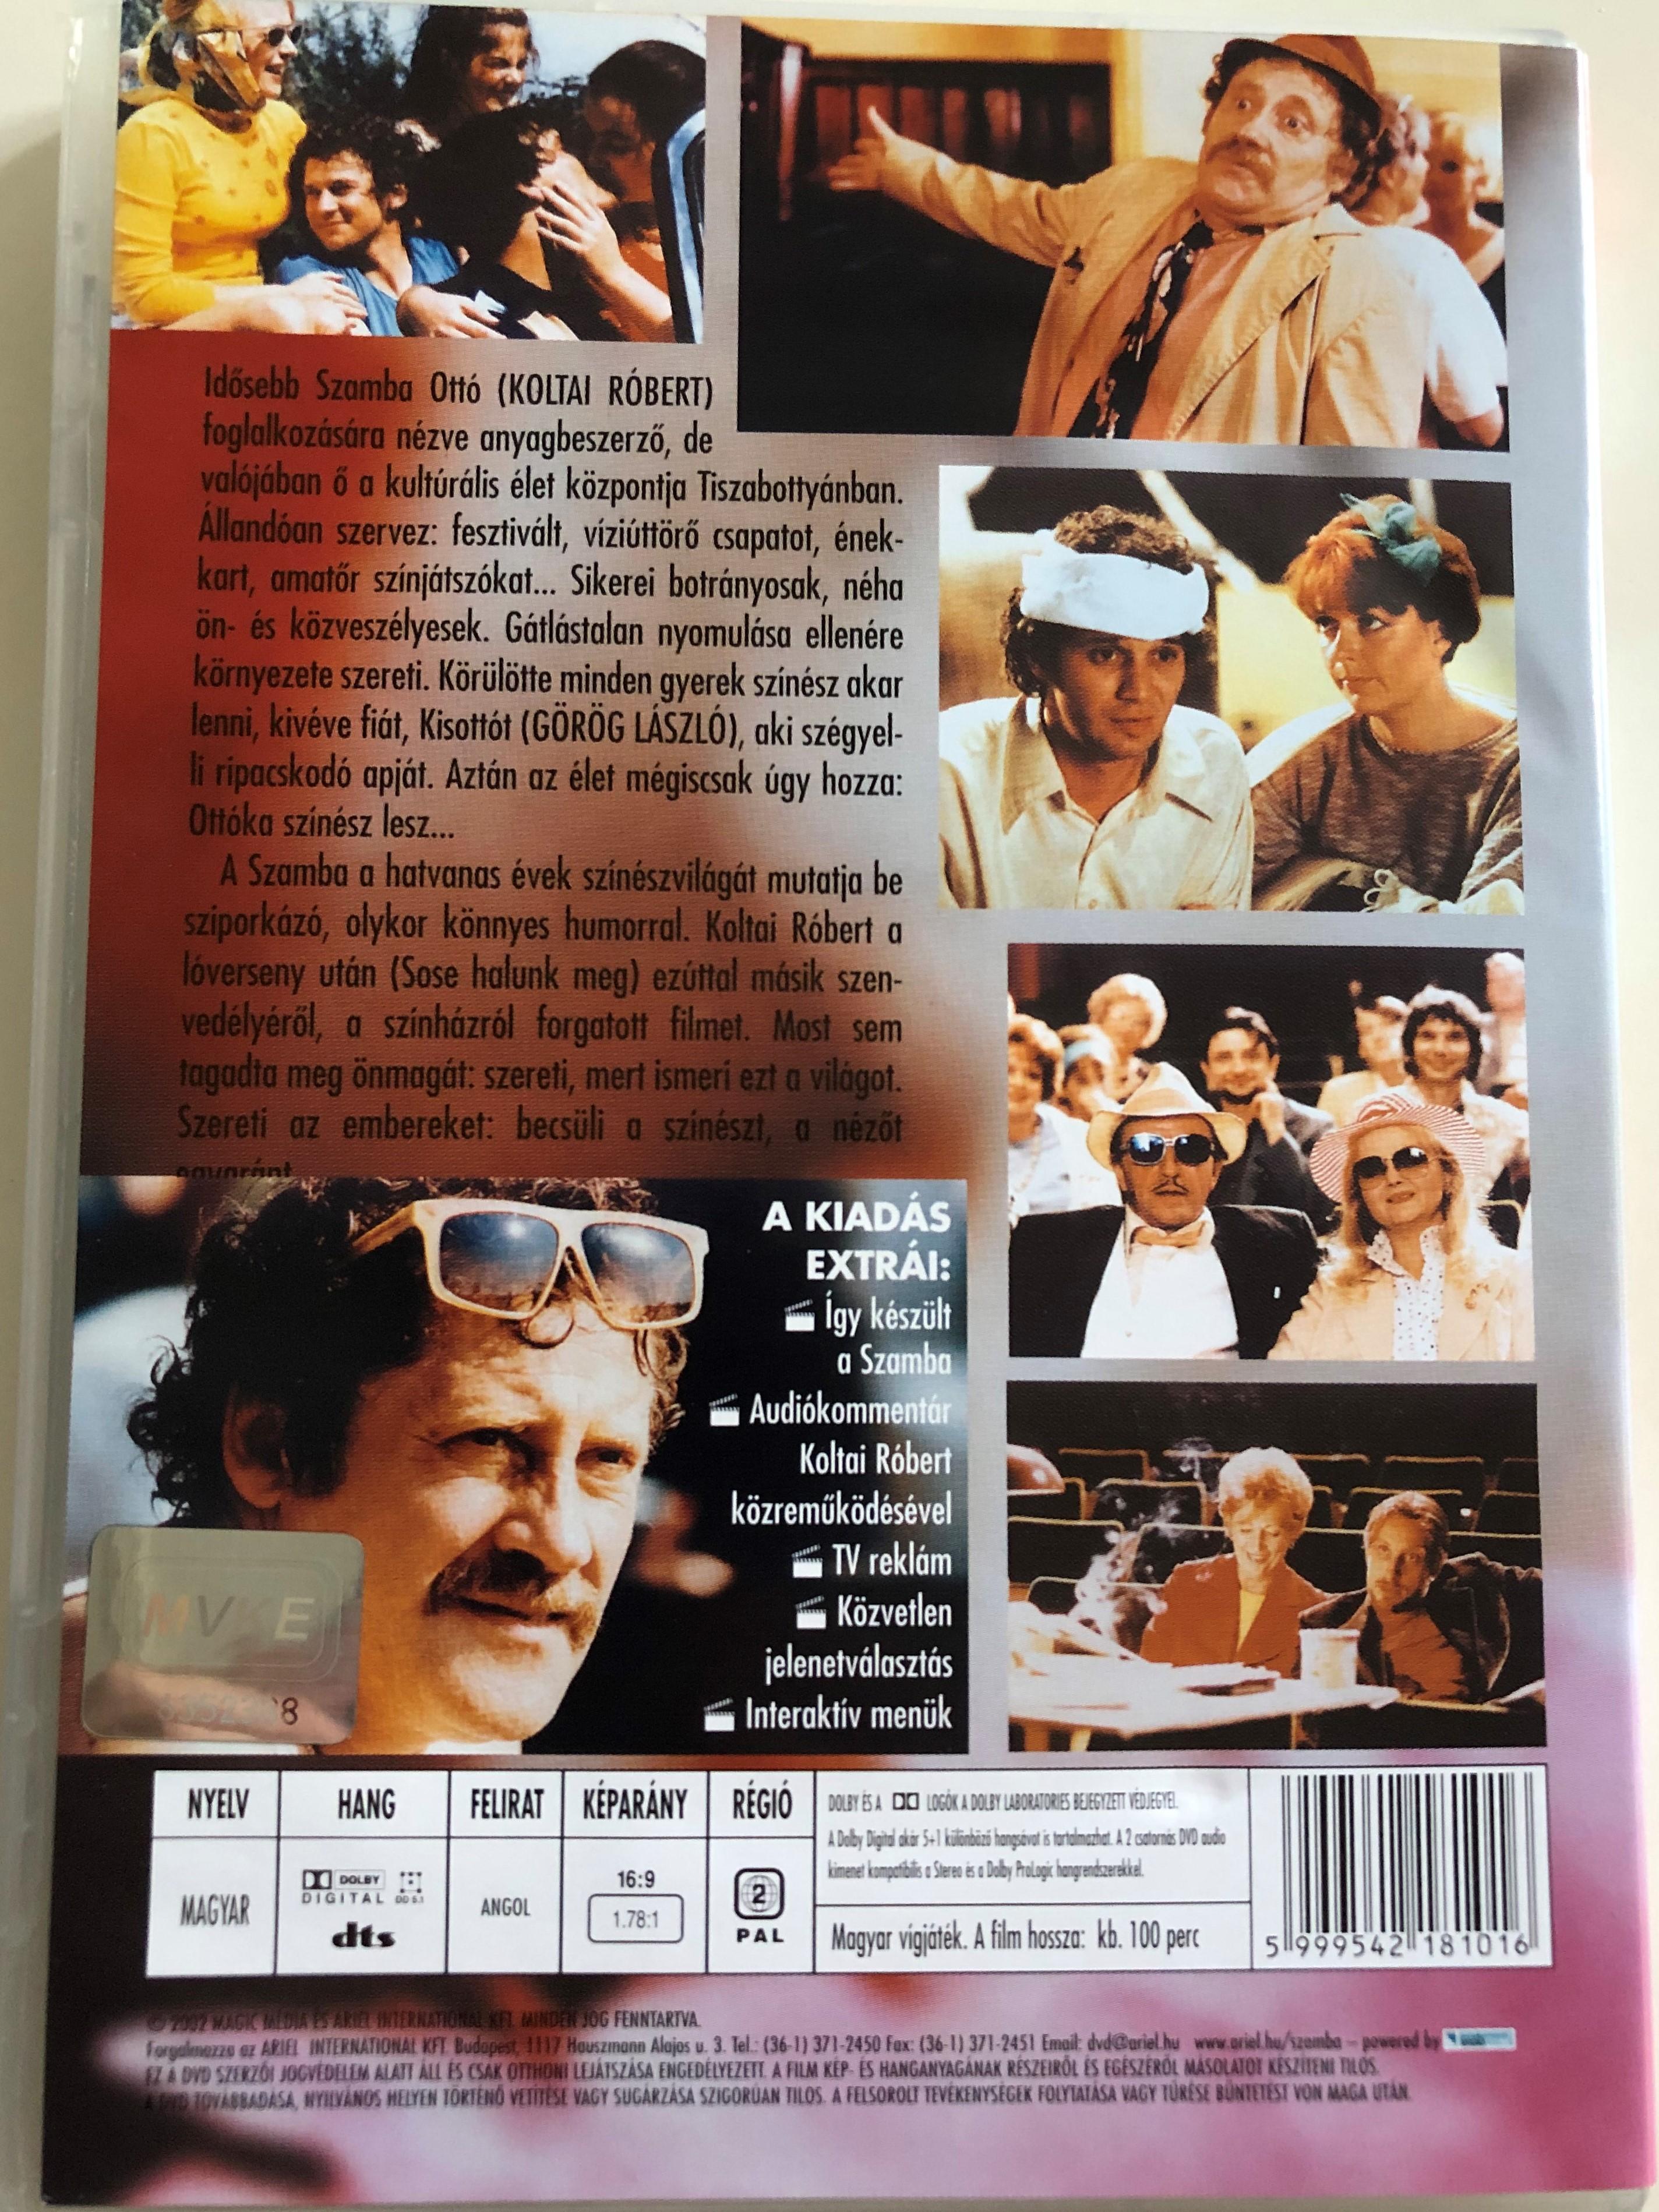 szamba-dvd-1996-directed-by-koltai-r-bert-starring-l-szl-g-r-g-r-bert-koltai-hungarian-comedy-film-2-.jpg